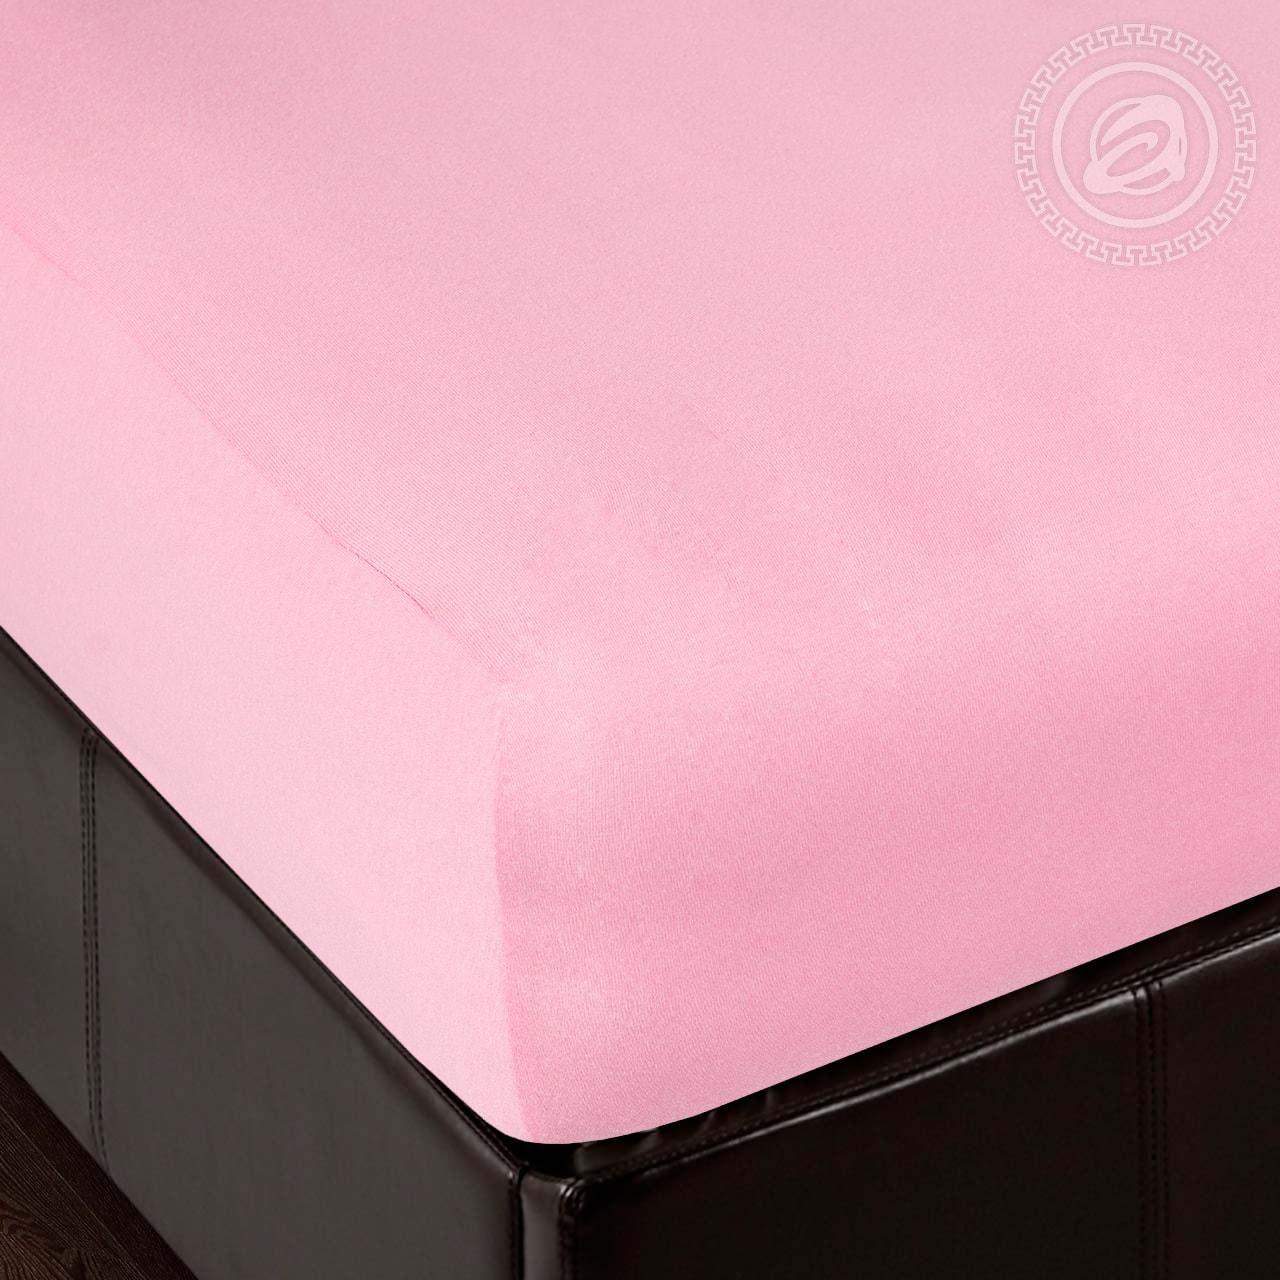 Простыня на резинке iv36277 (трикотаж) 60х120